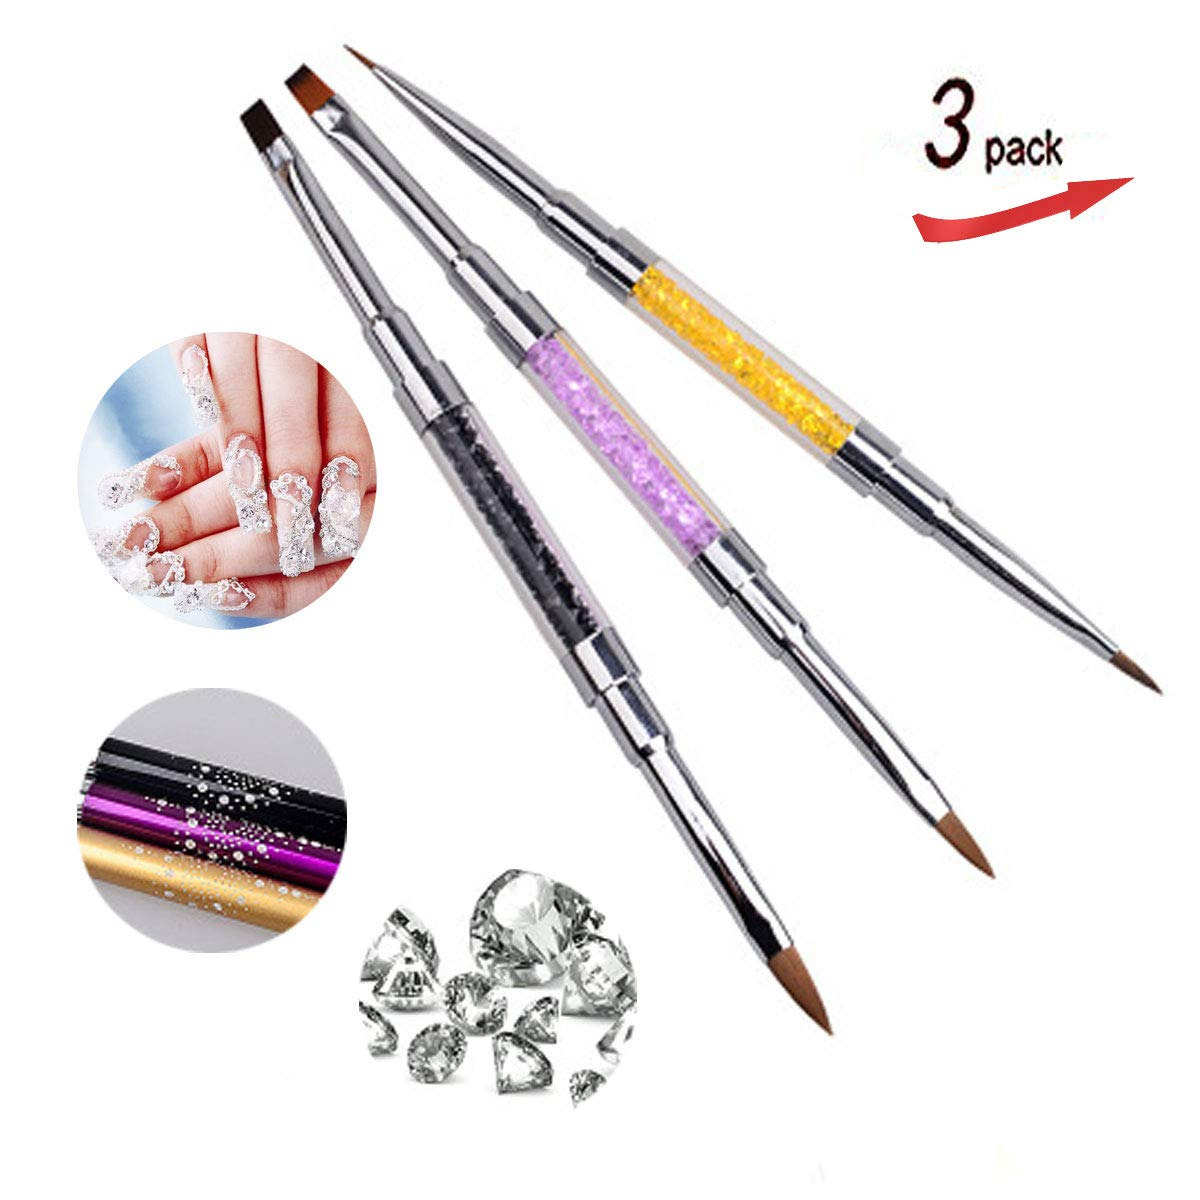 3PCS 2 in 1 Acrylic Nail Brush for 3D Nail Art Design DIY Manicure Pedicure Tips Dual Head Brush Rhinestone Handle Professional Nail Art Tools by VOLODIA